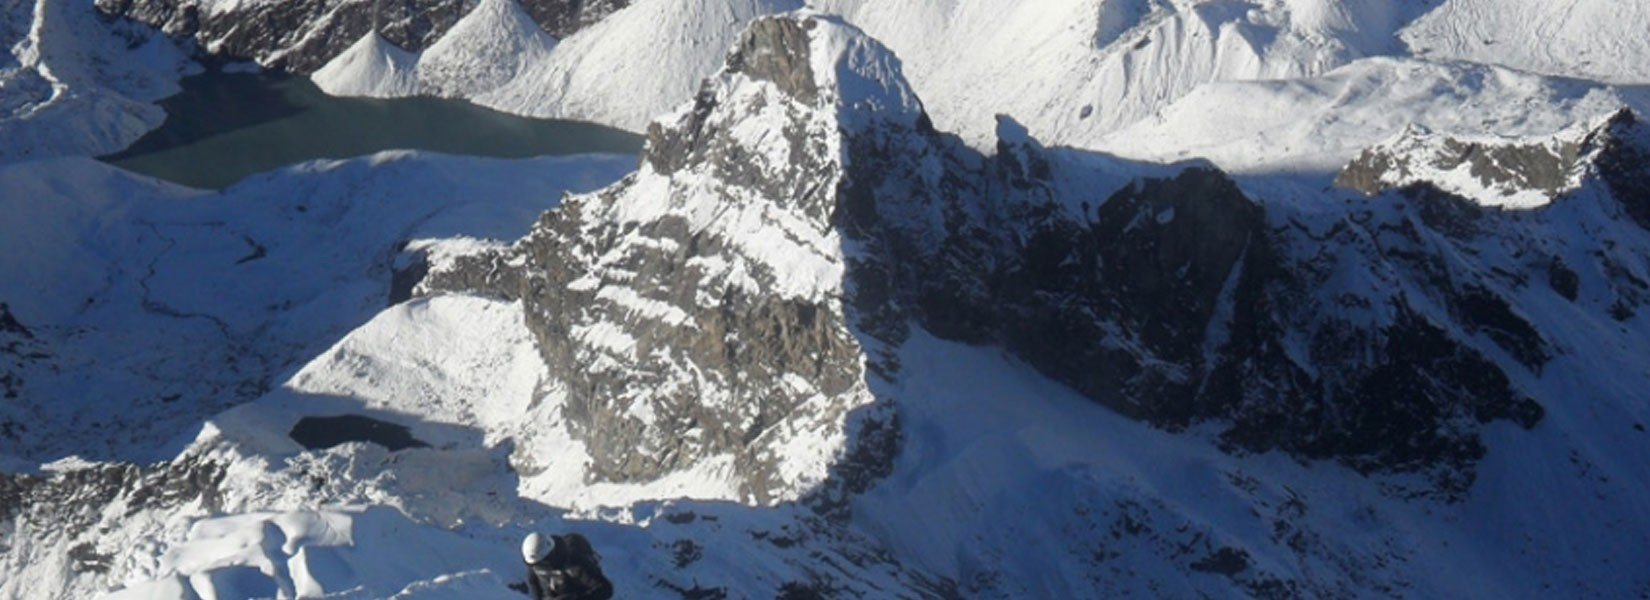 Island Peak - Imjatse Himal Climb